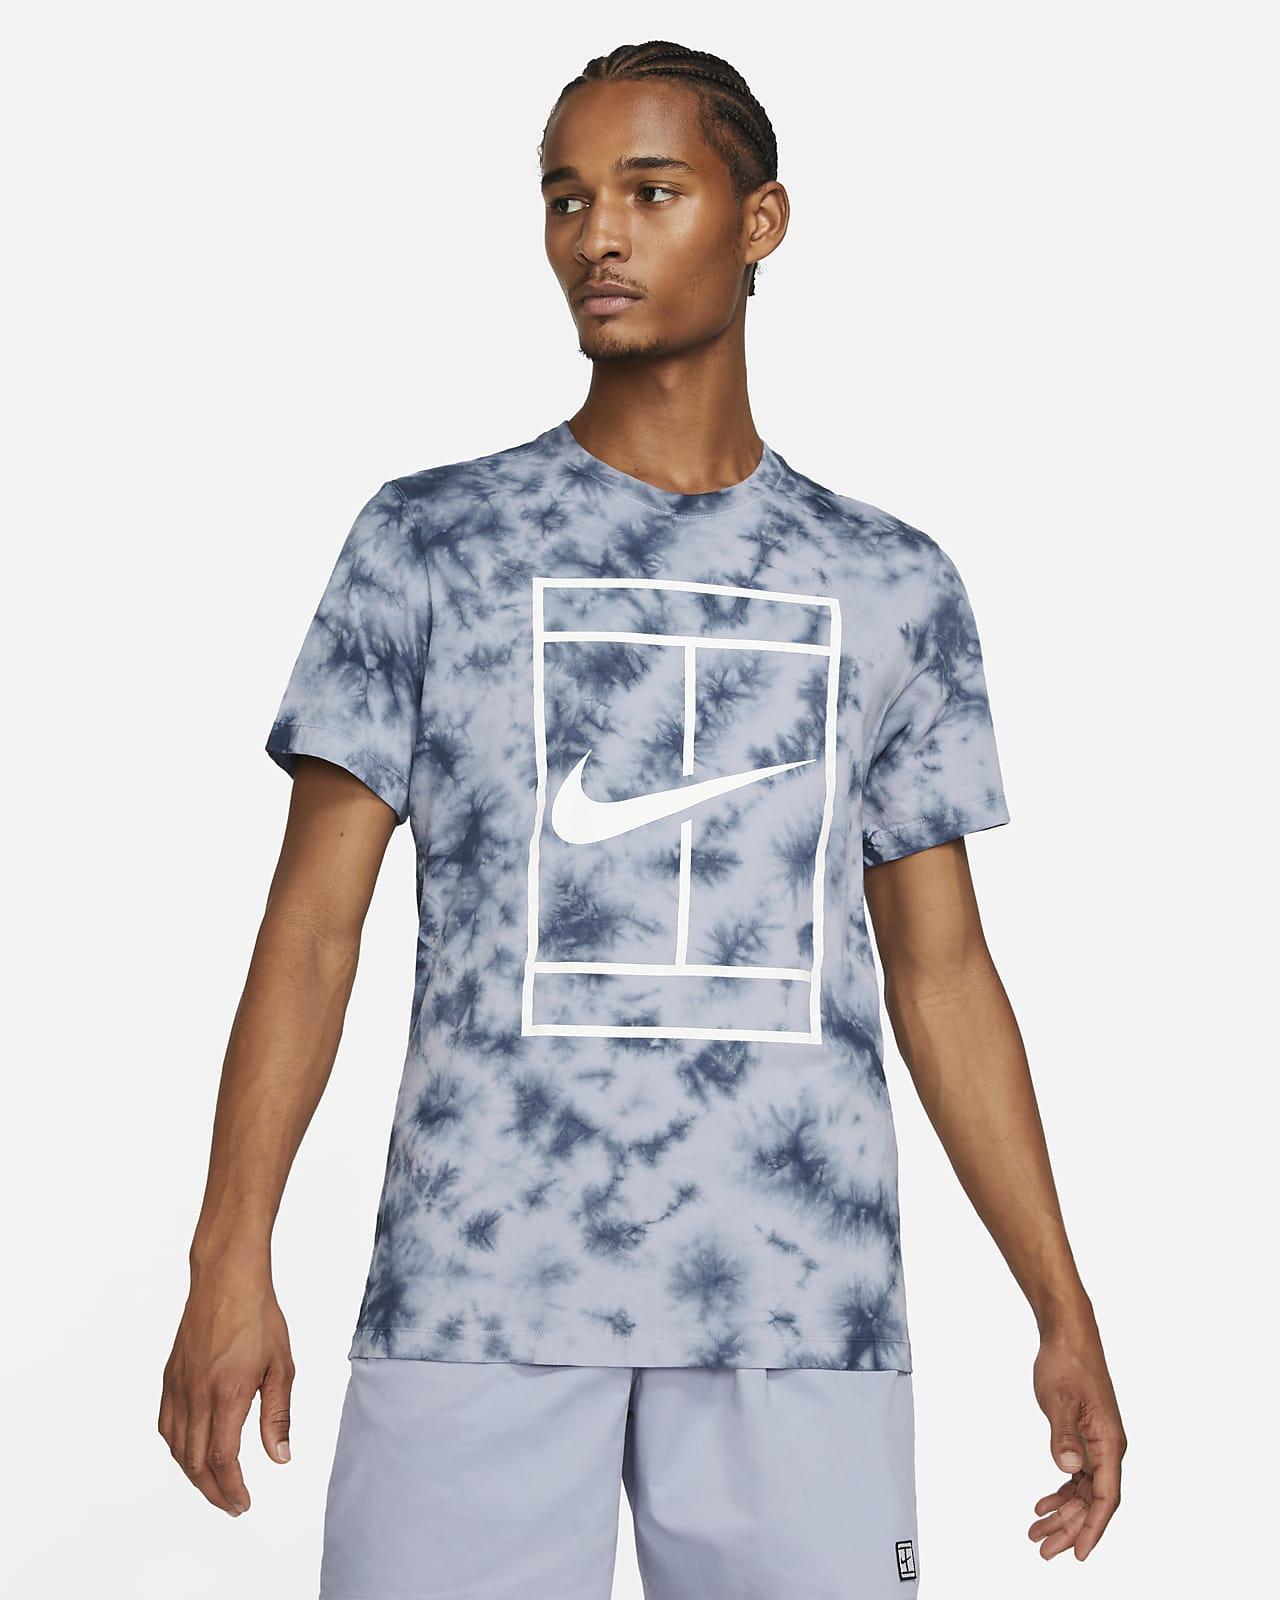 NikeCourt Men's Tie-Dye Tennis T-Shirt